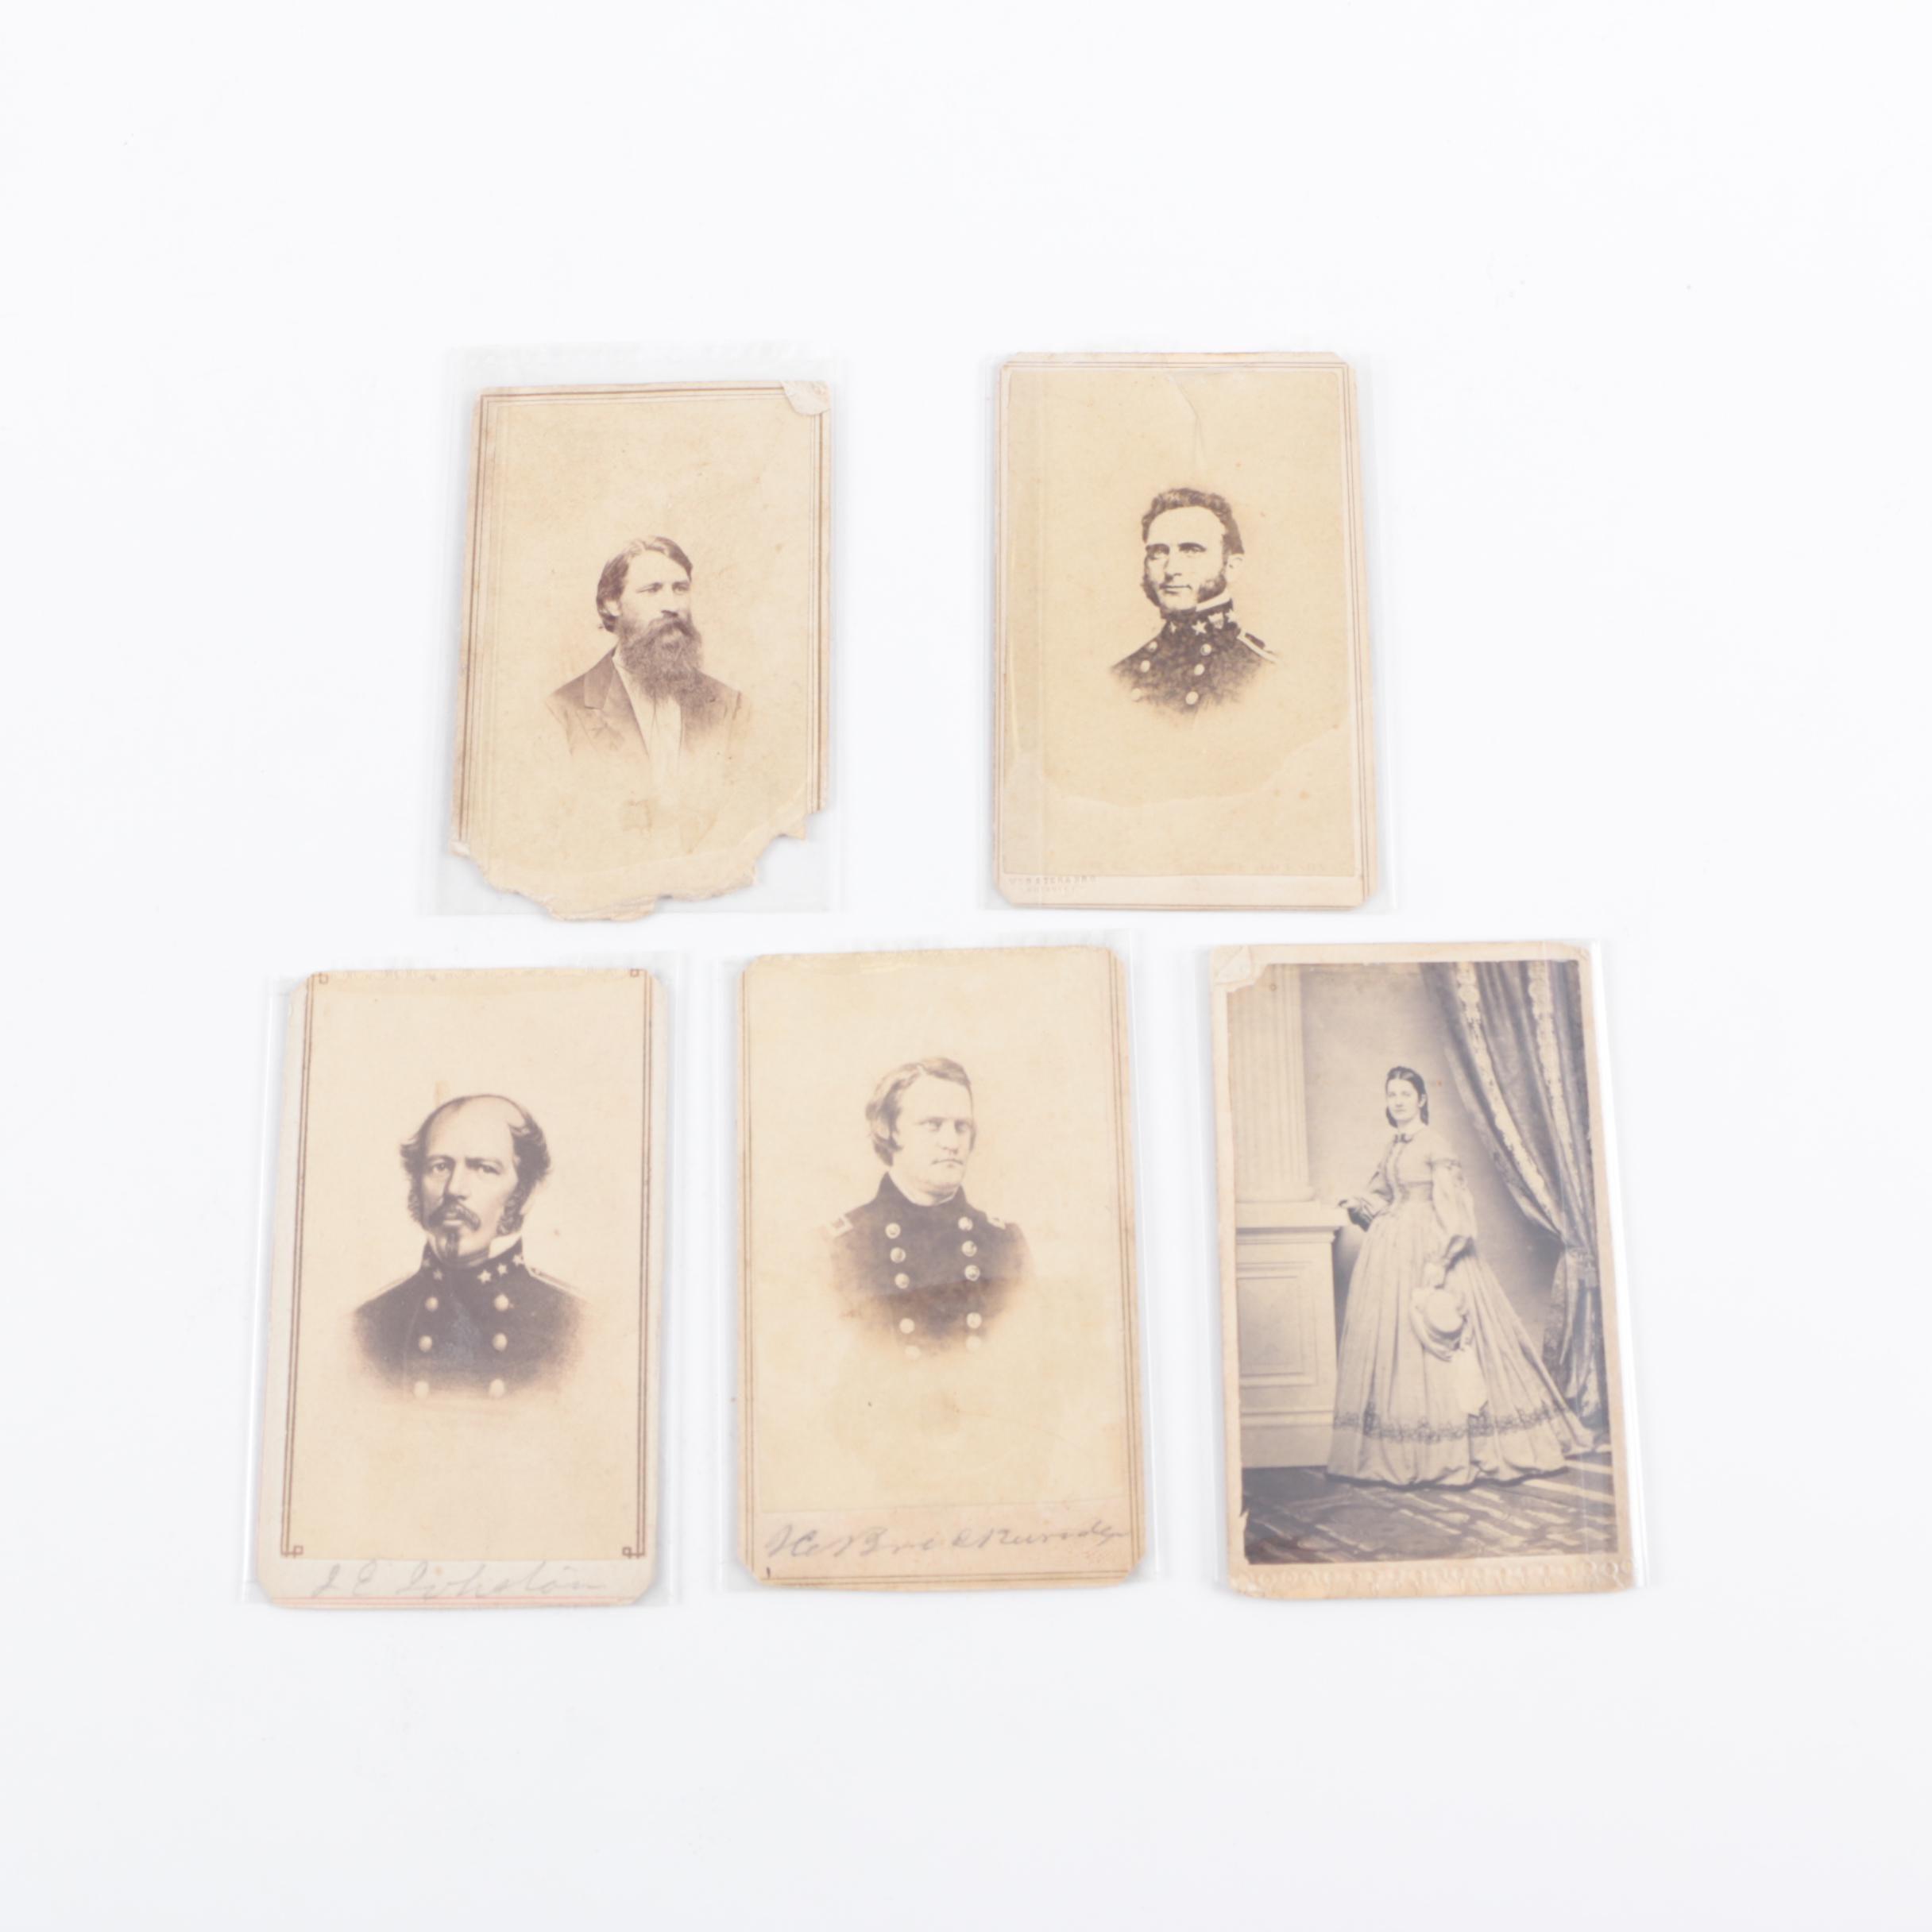 Five Civil War Era Photographic Cartes de Visite